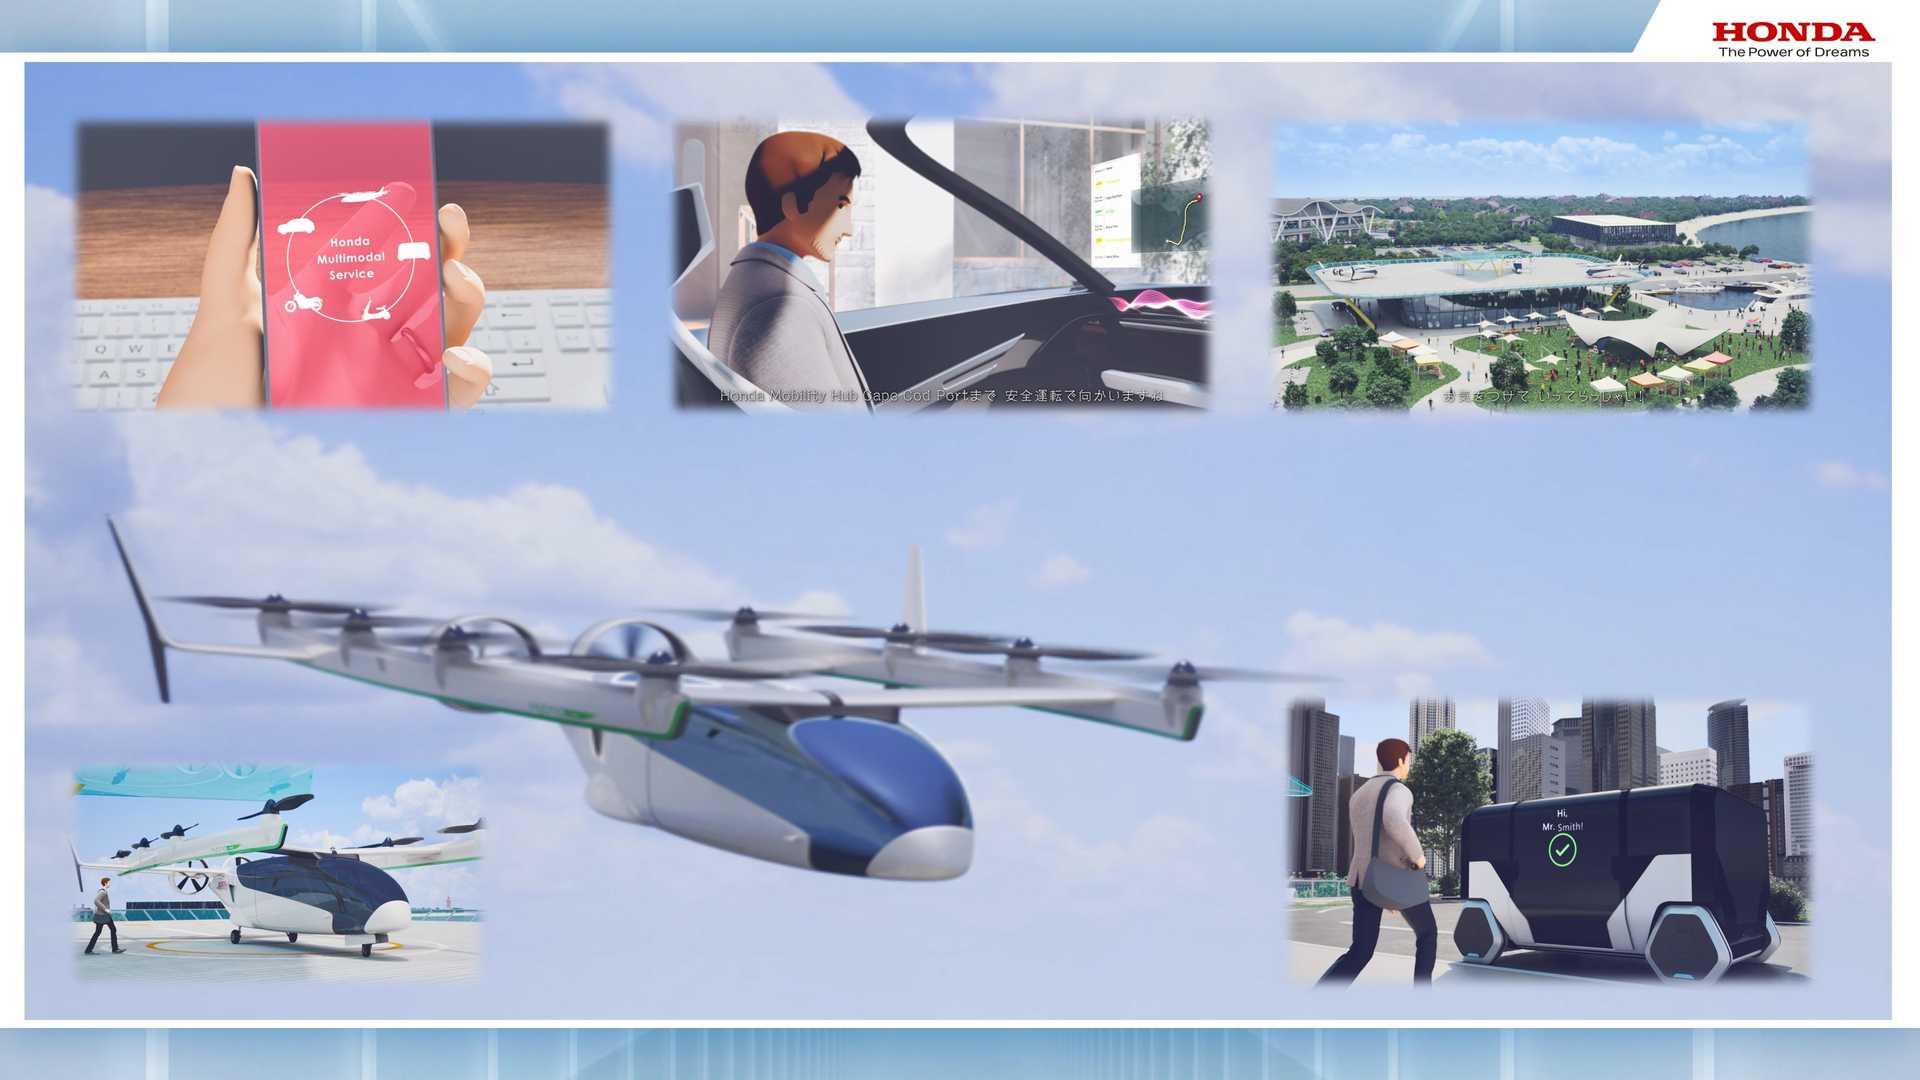 Honda-eVTOL-Hybrid-Mobility-Aircraft-5